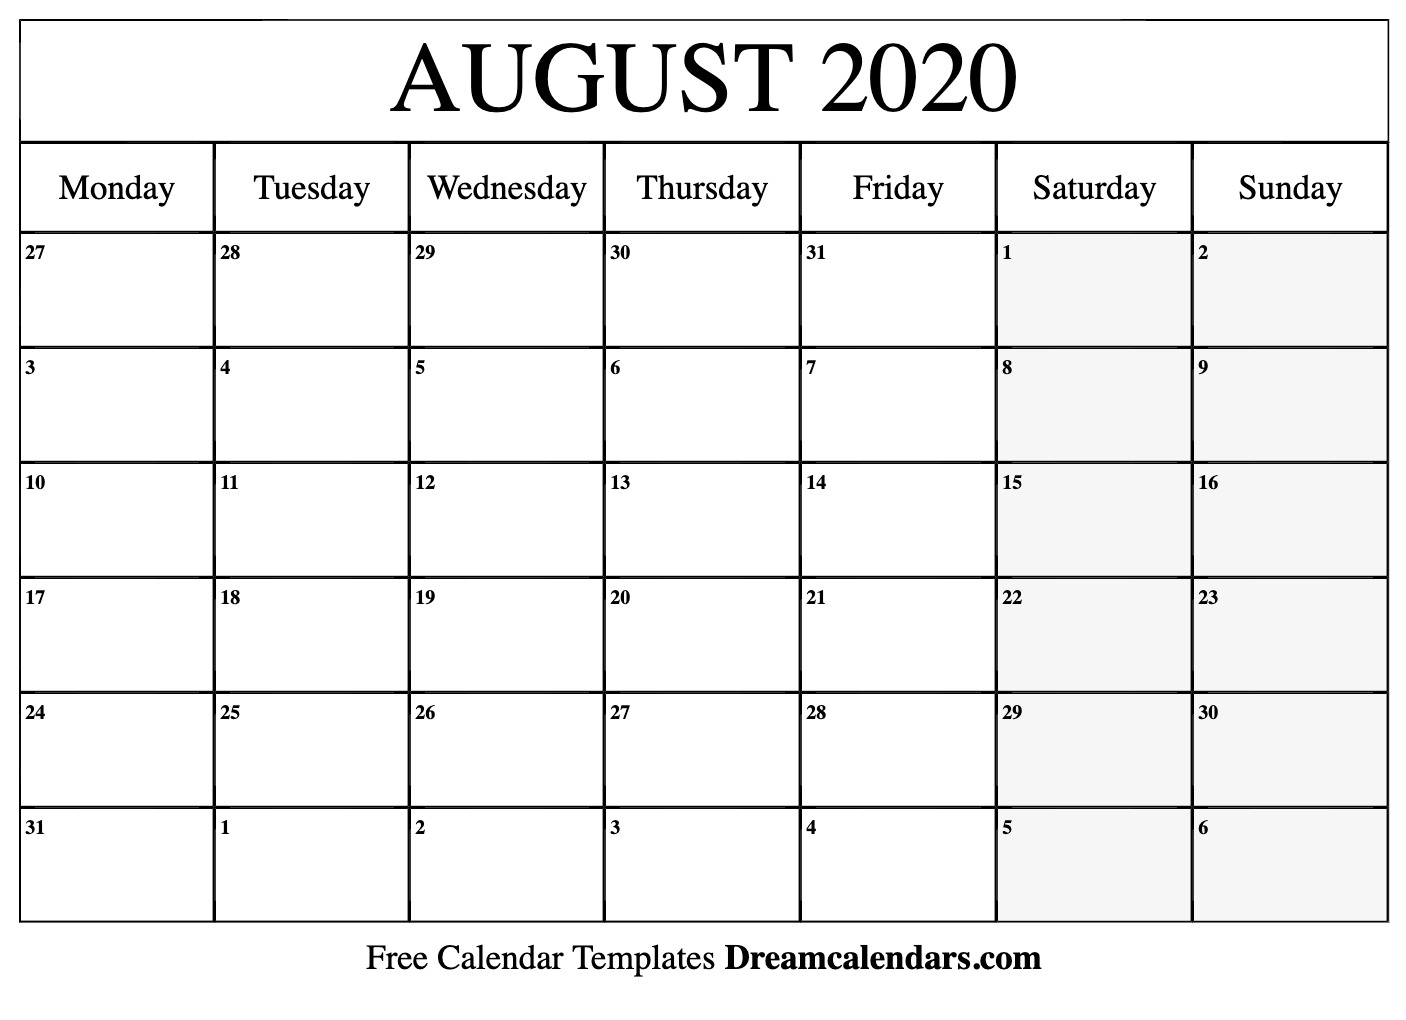 Printable August 2020 Calendar for Kid Freiendly August 2020 Calendars